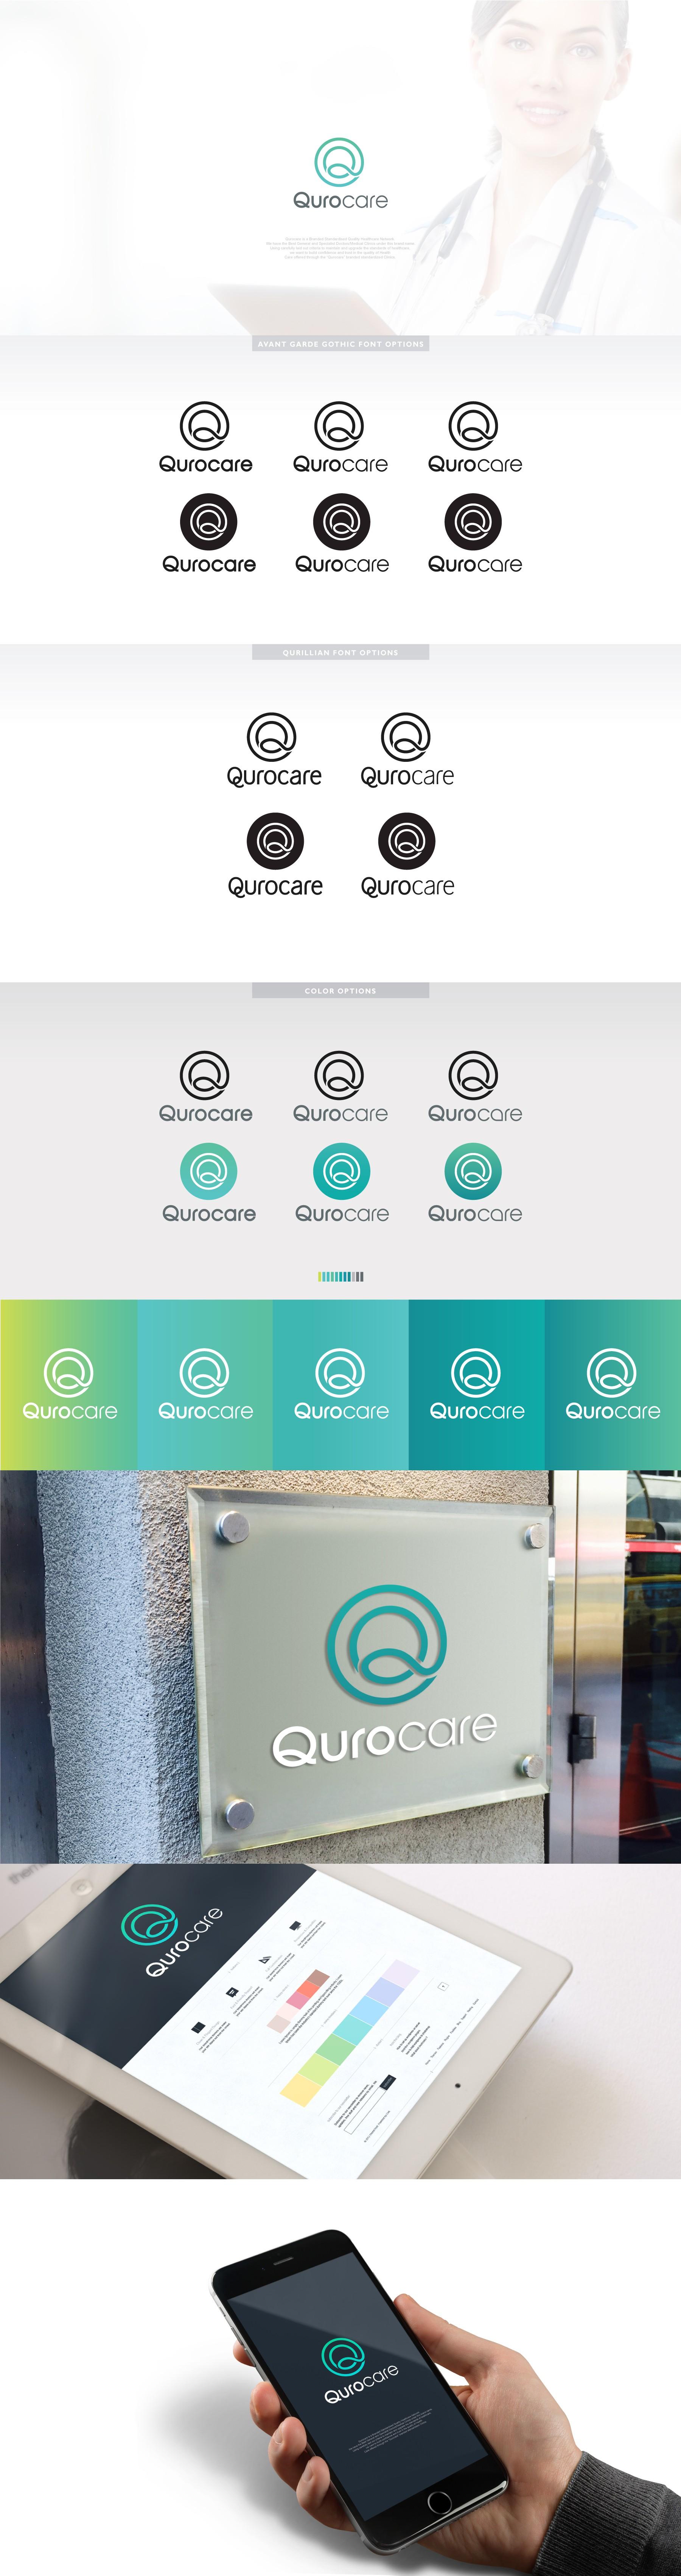 Create a Healthcare Network Brand (Logo/ Website design)